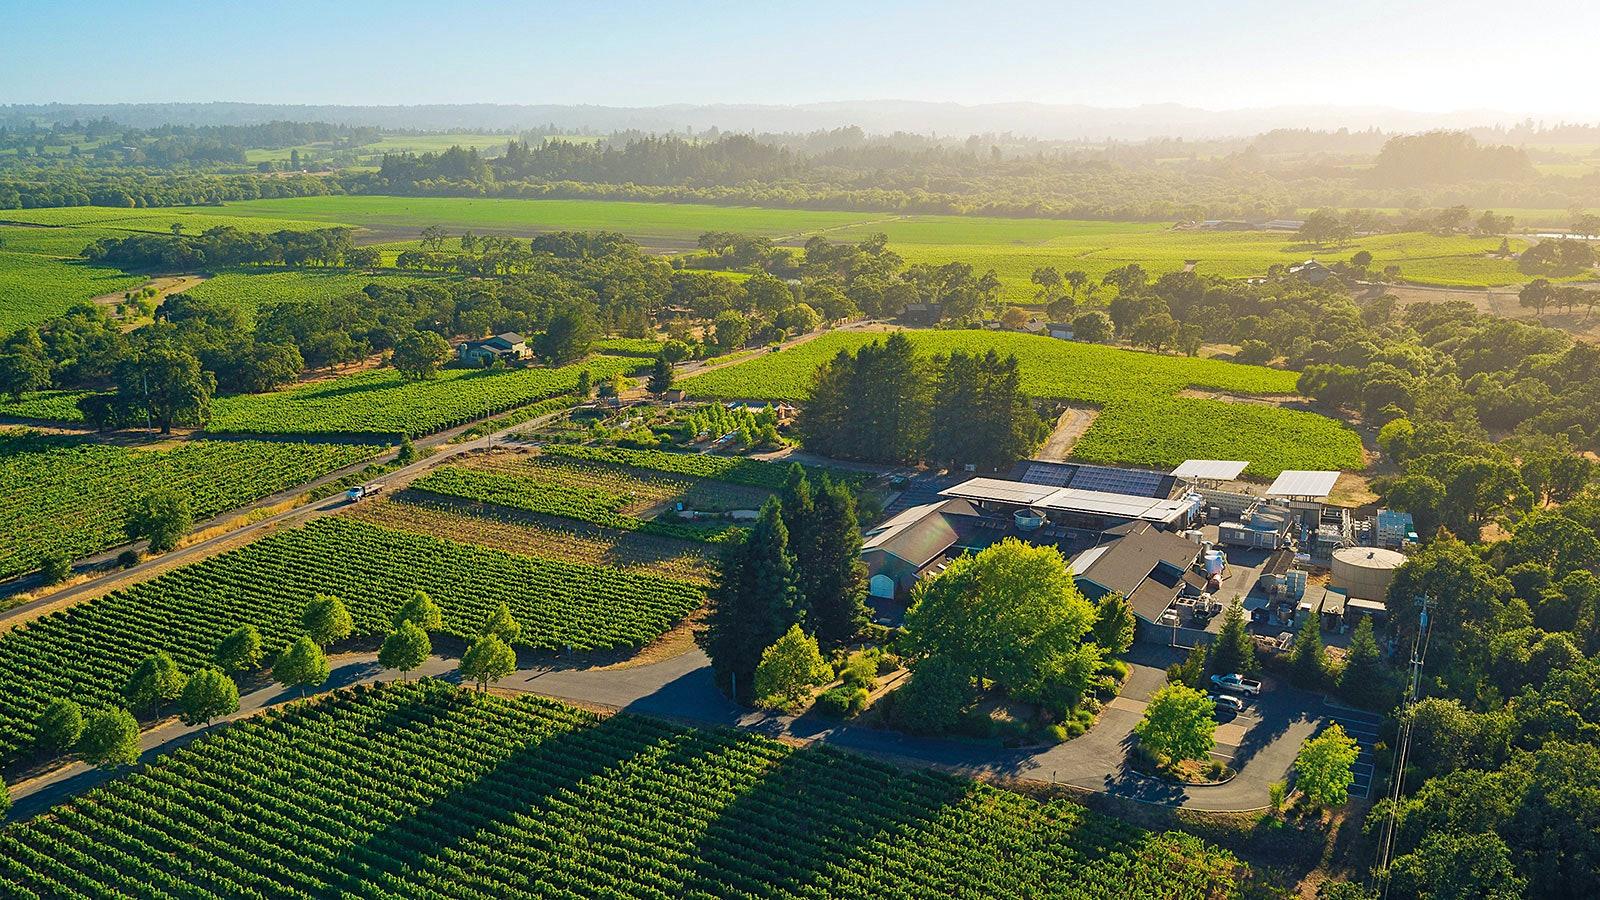 Aerialimage of Loach Vineyards